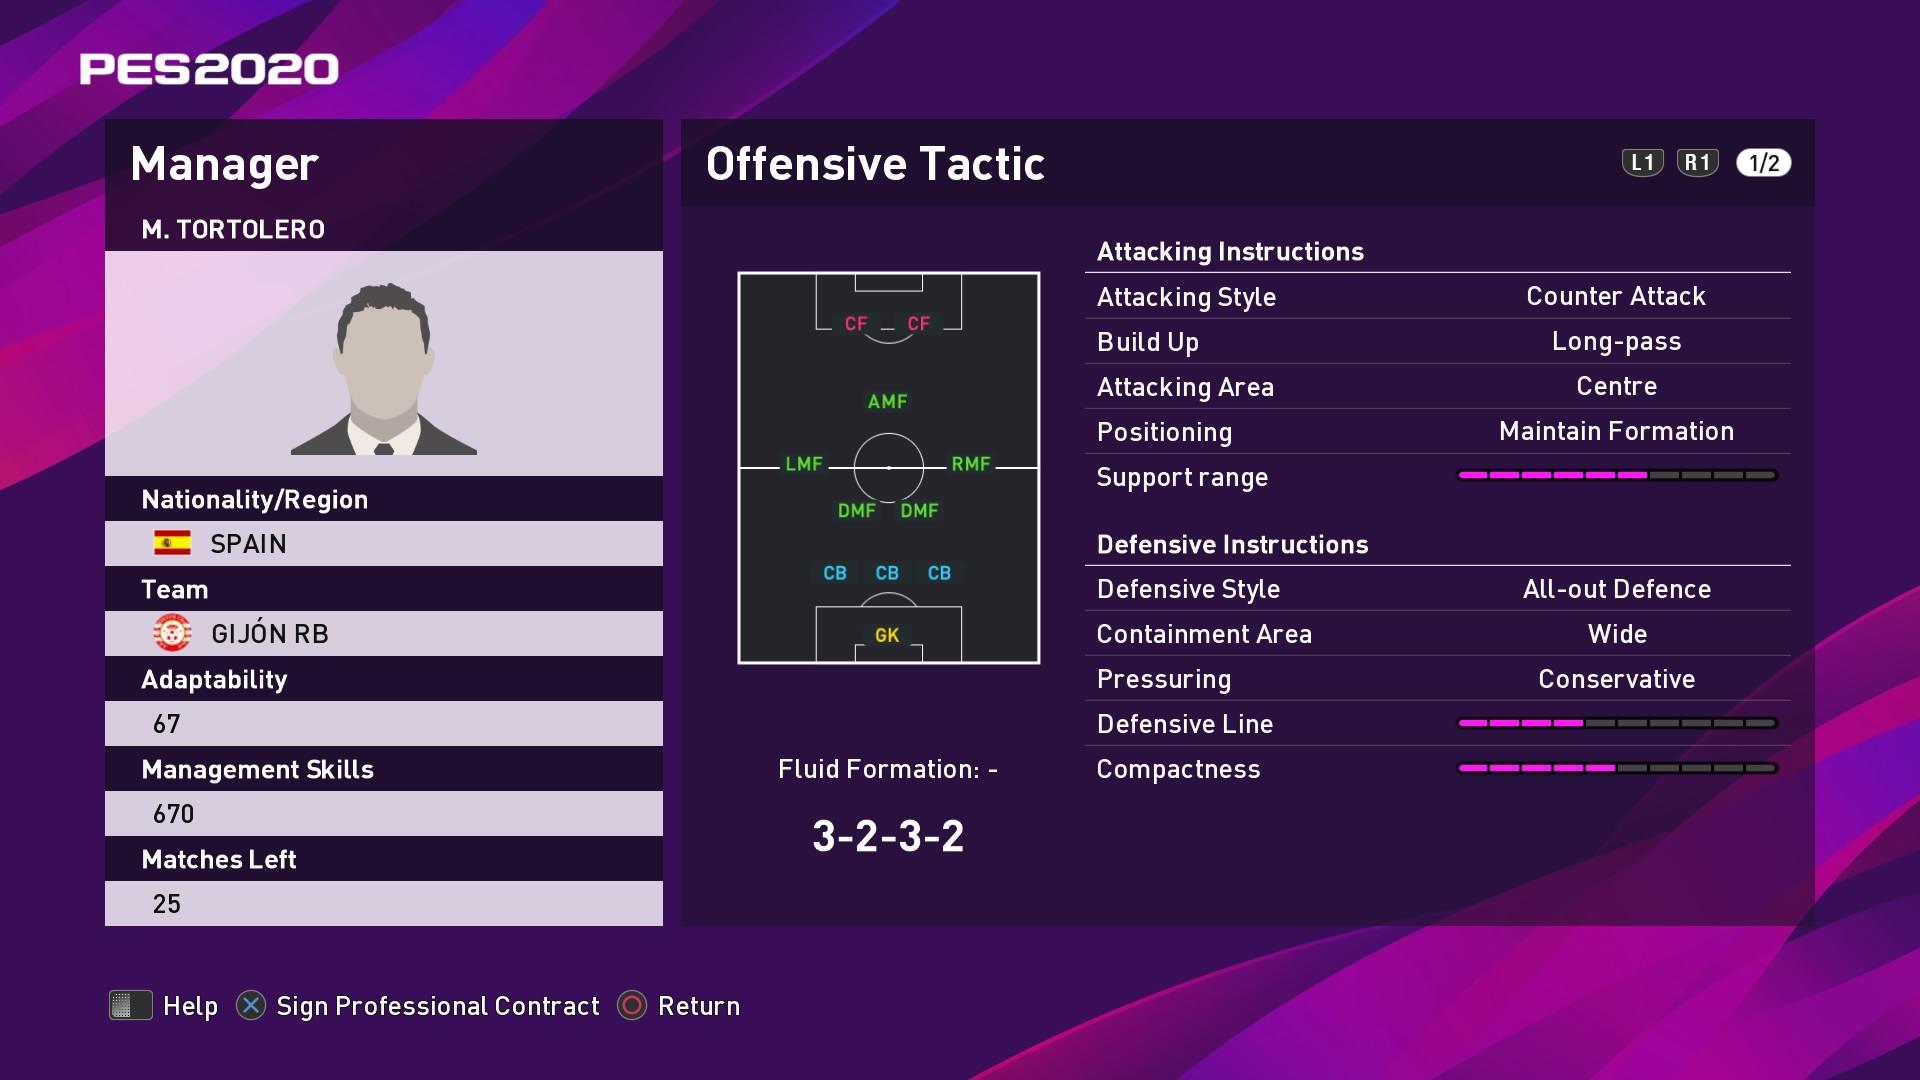 M. Tortolero (José Alberto) Offensive Tactic in PES 2020 myClub